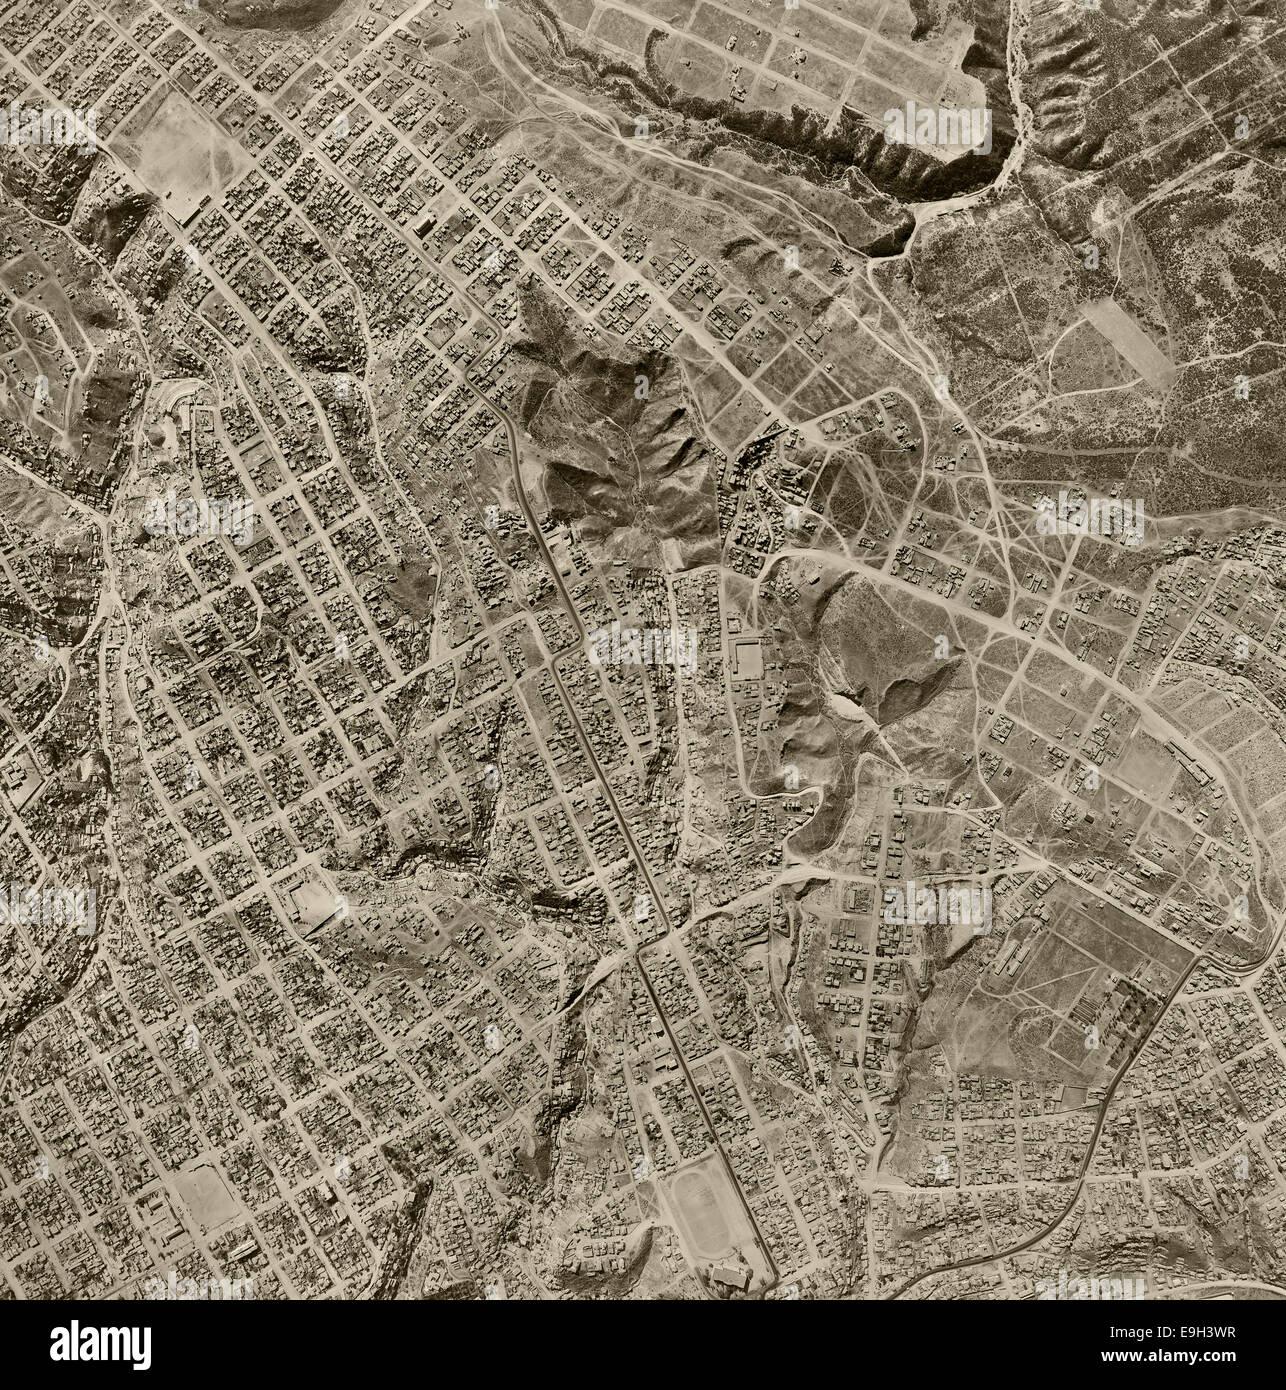 historical aerial photograph Tijuana, Baja, Mexico, 1962 - Stock Image